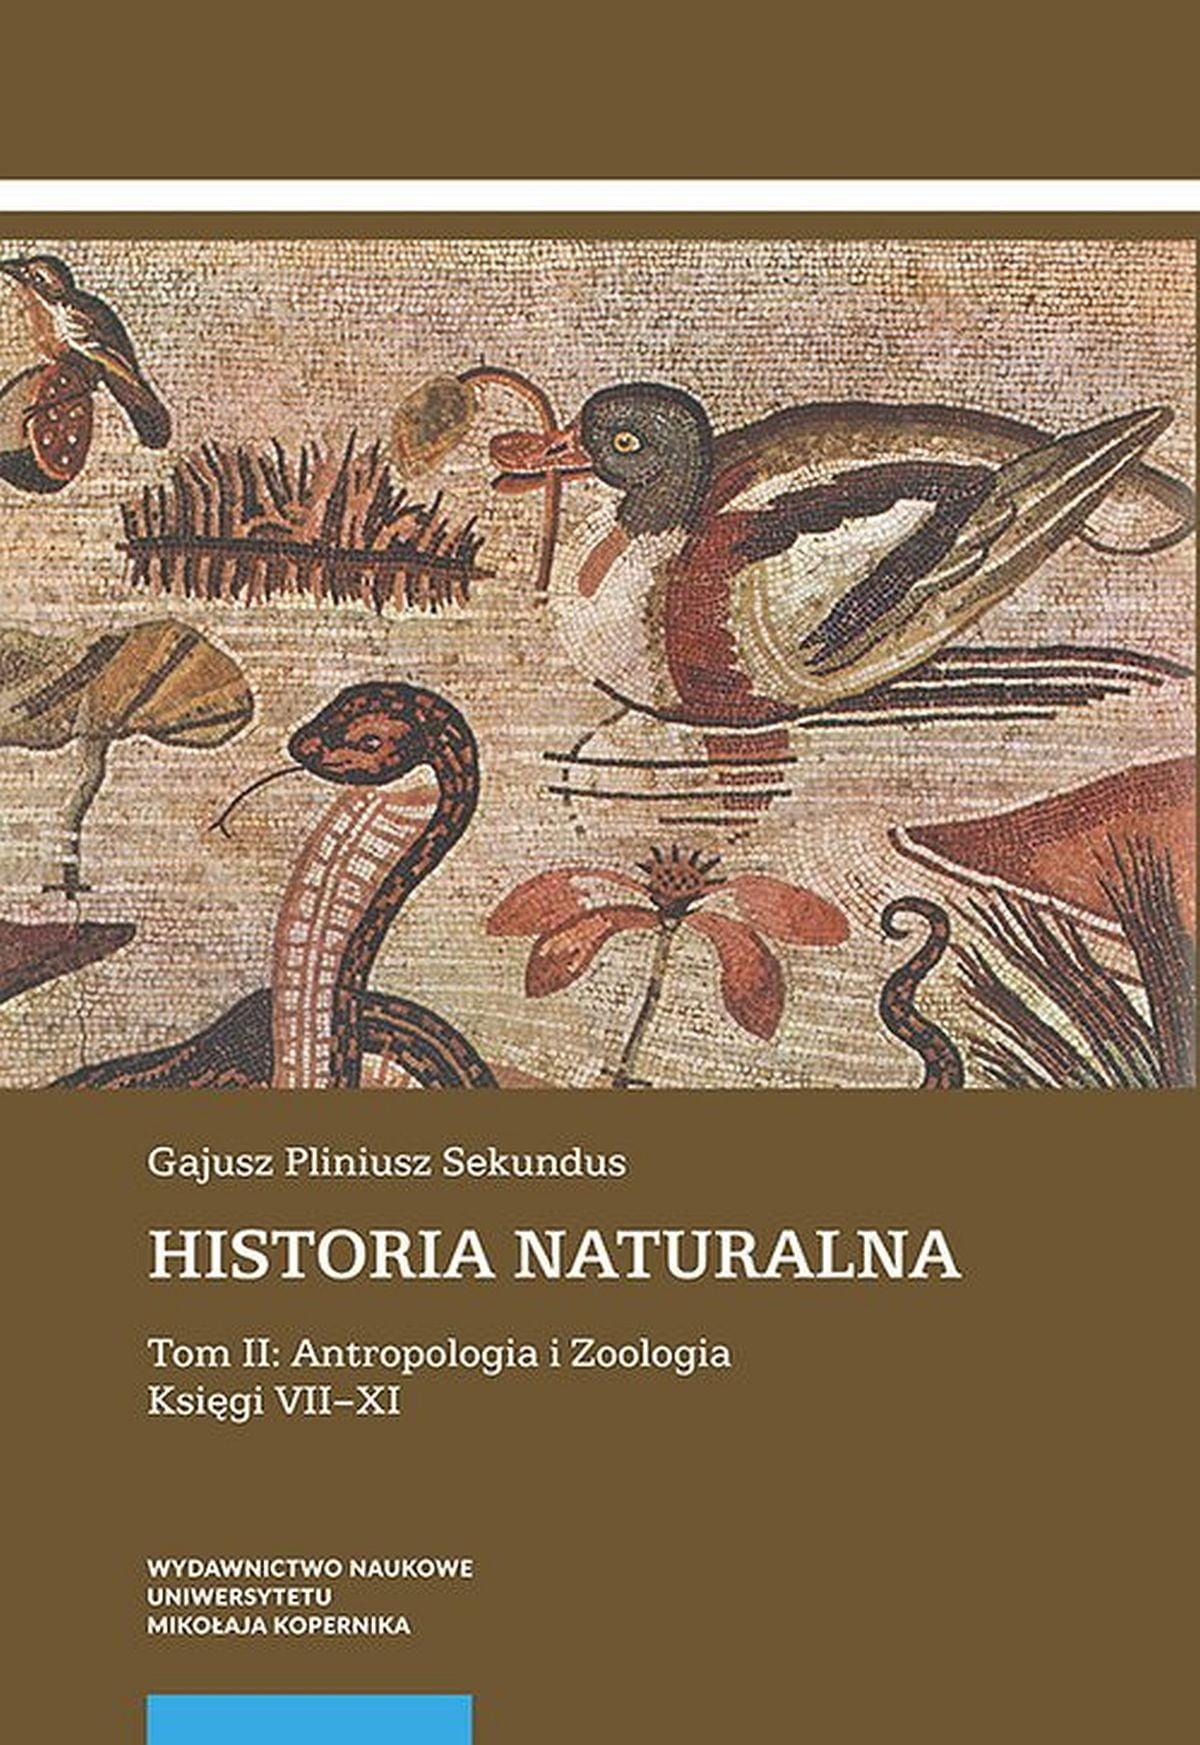 Historia naturalna. Tom II. Antropologia i Zoologia Księgi VII-XI